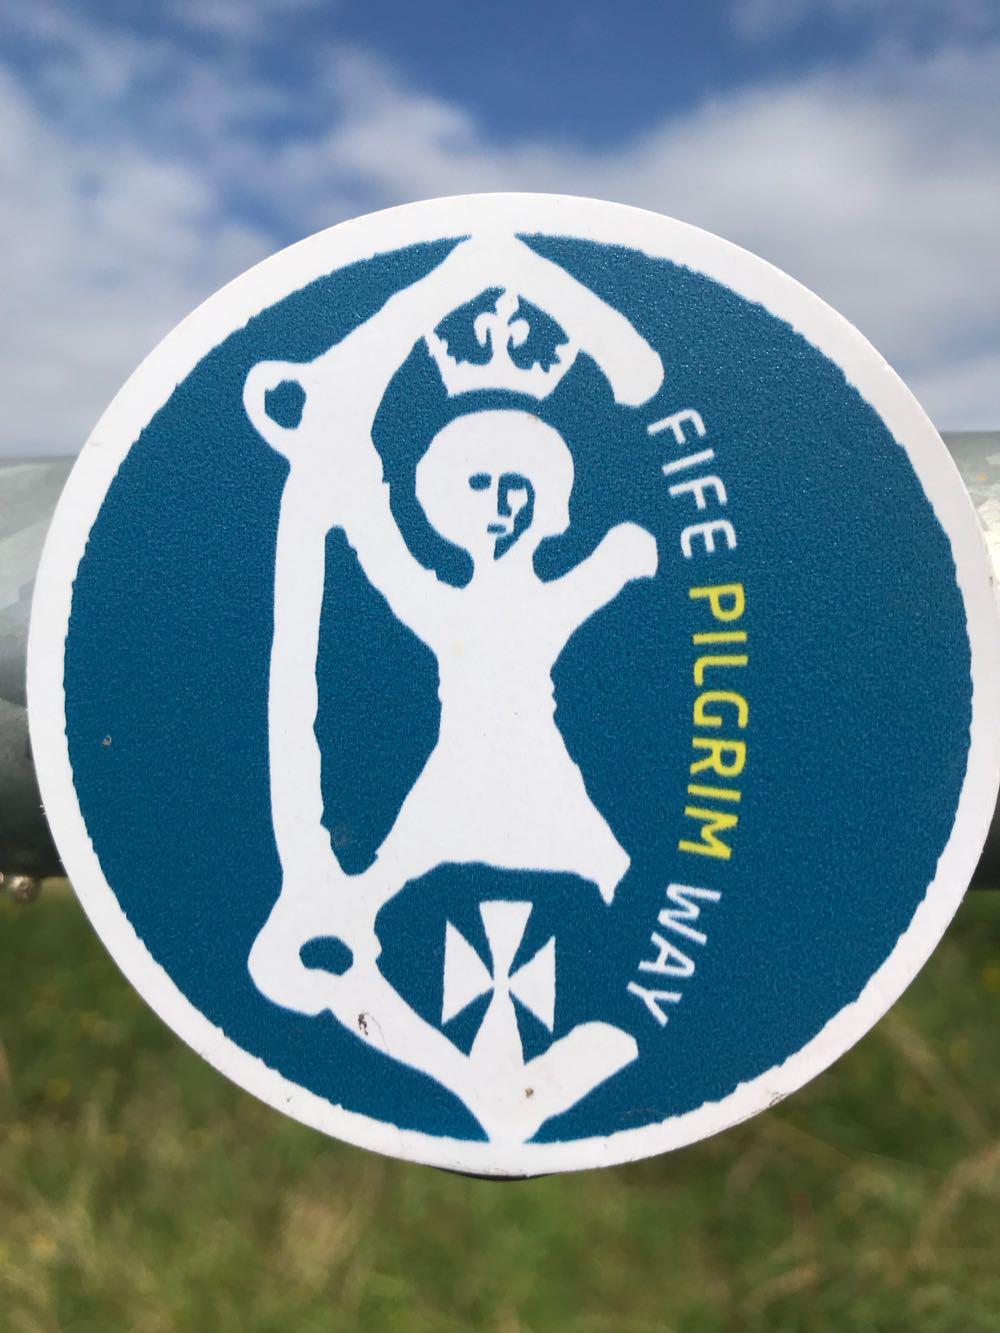 Walking the Fife Pilgrim Way